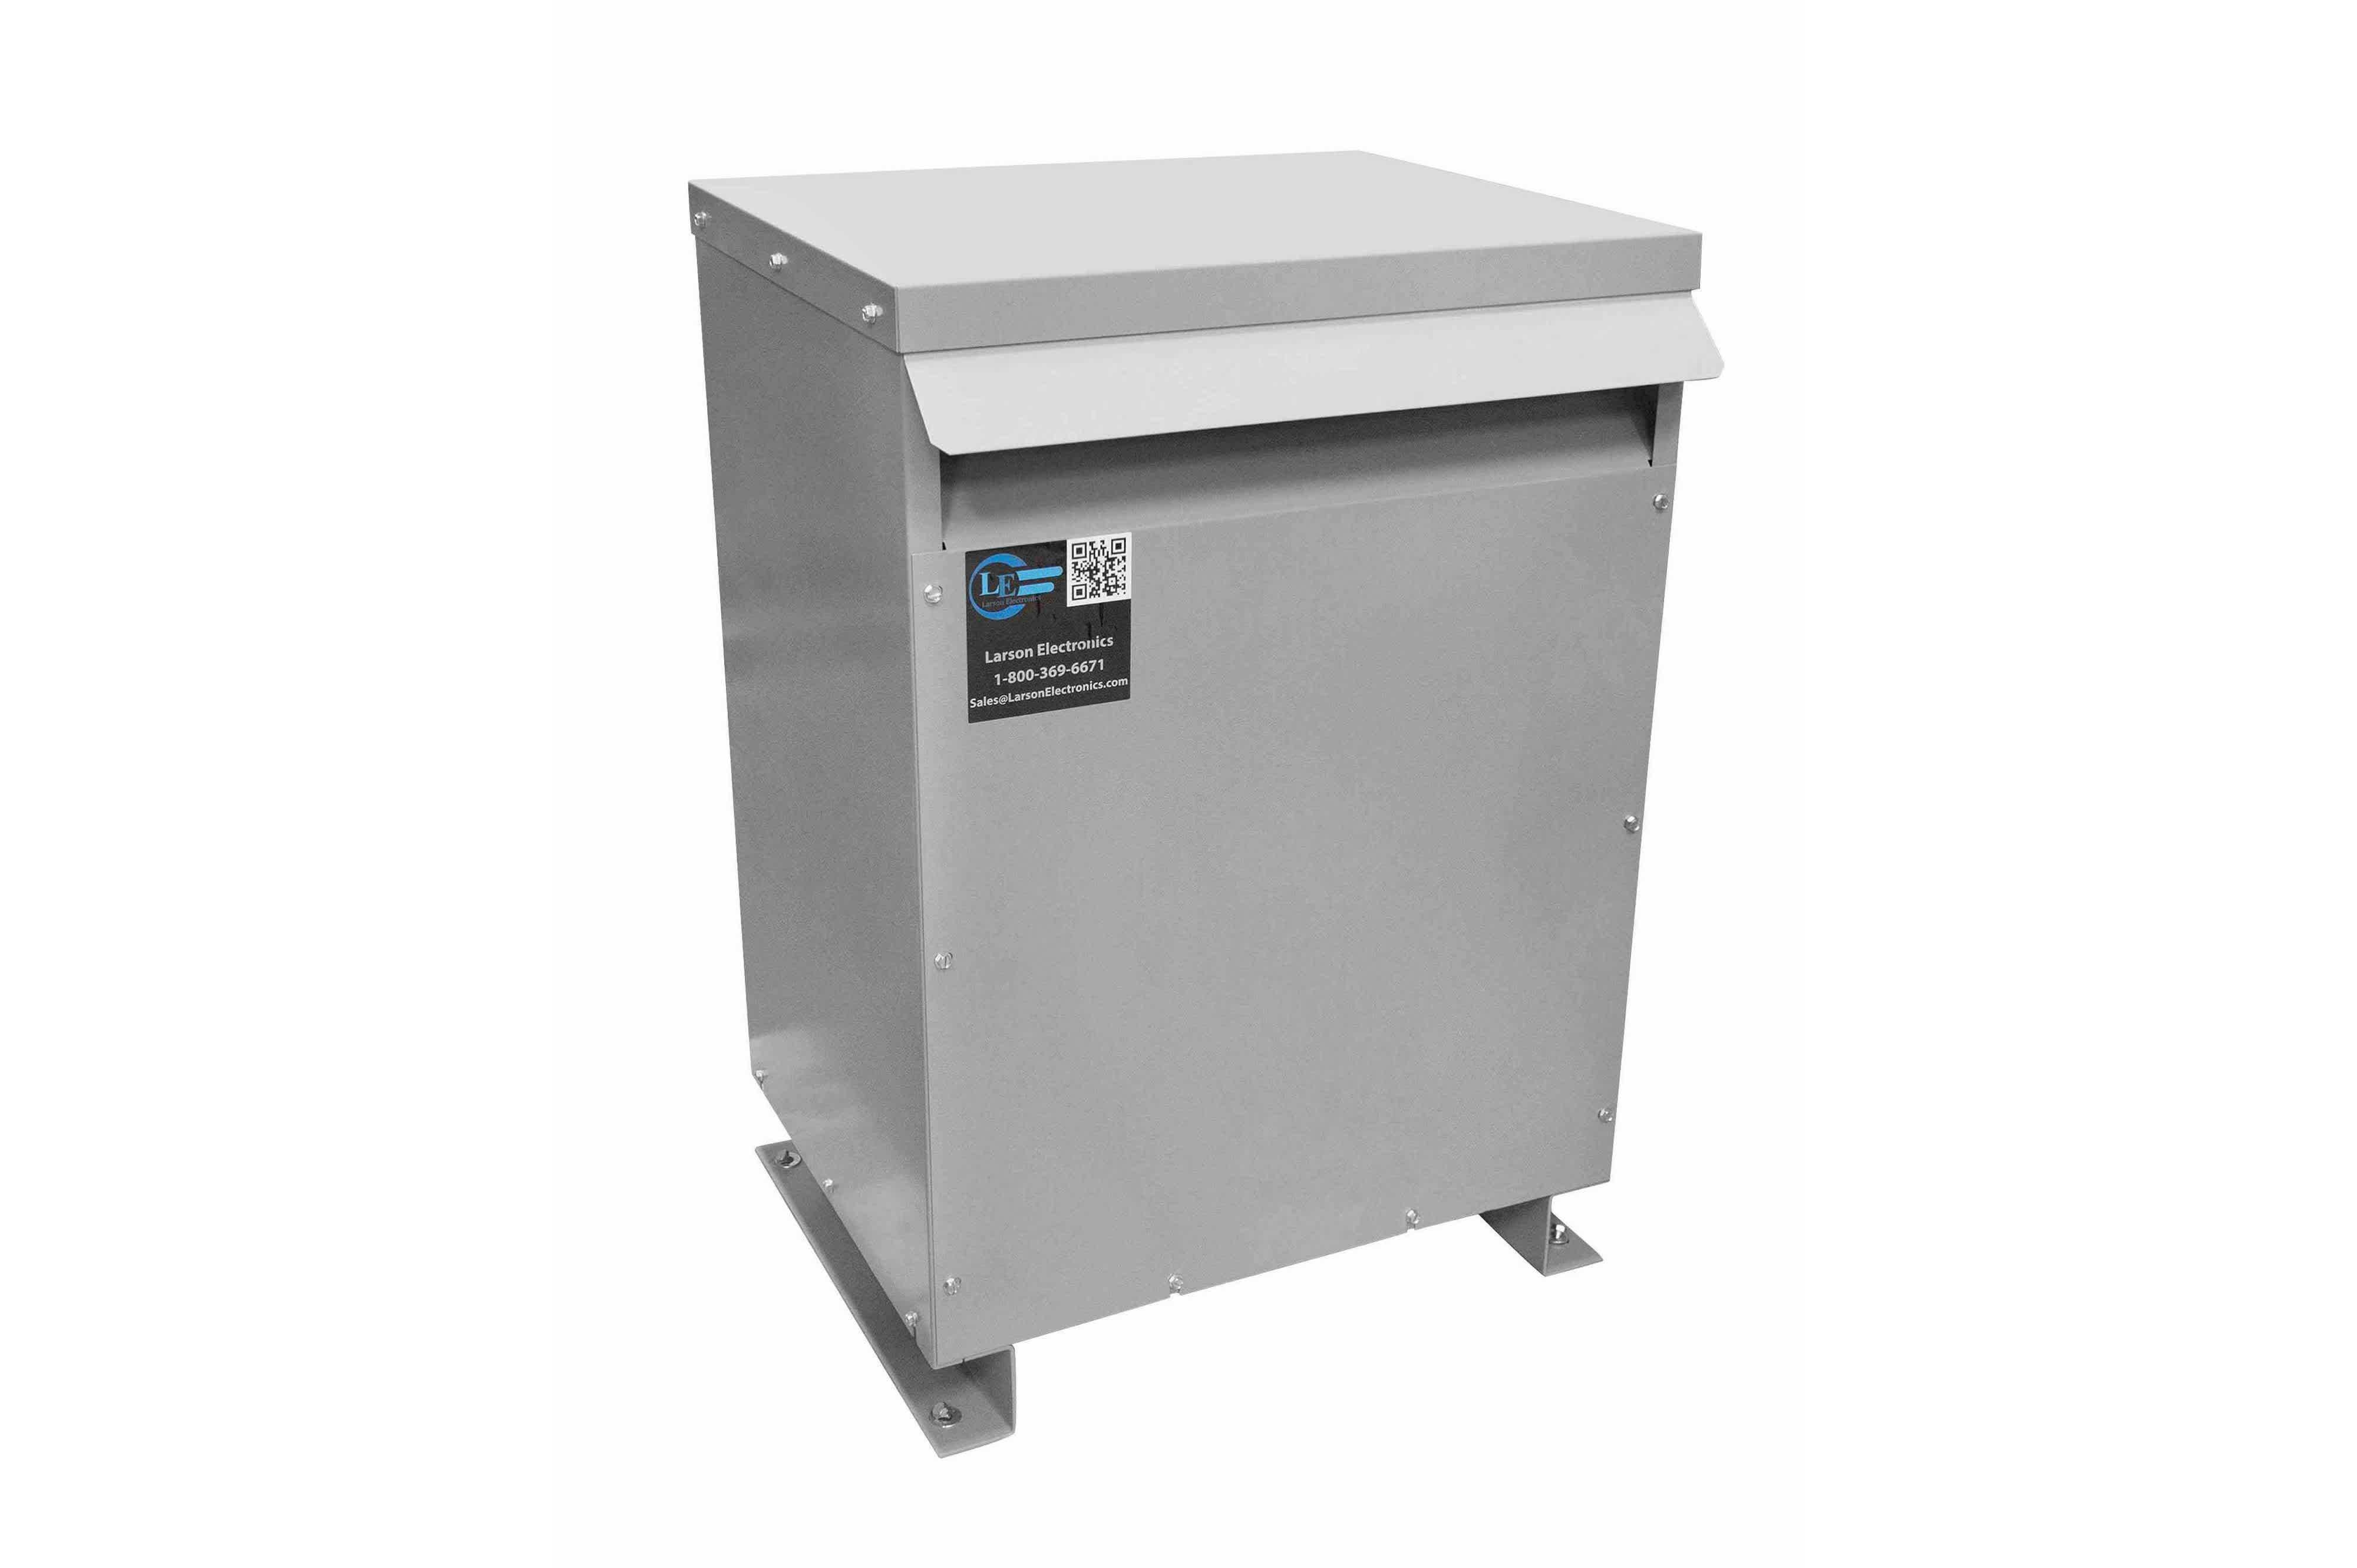 9 kVA 3PH Isolation Transformer, 575V Wye Primary, 208V Delta Secondary, N3R, Ventilated, 60 Hz